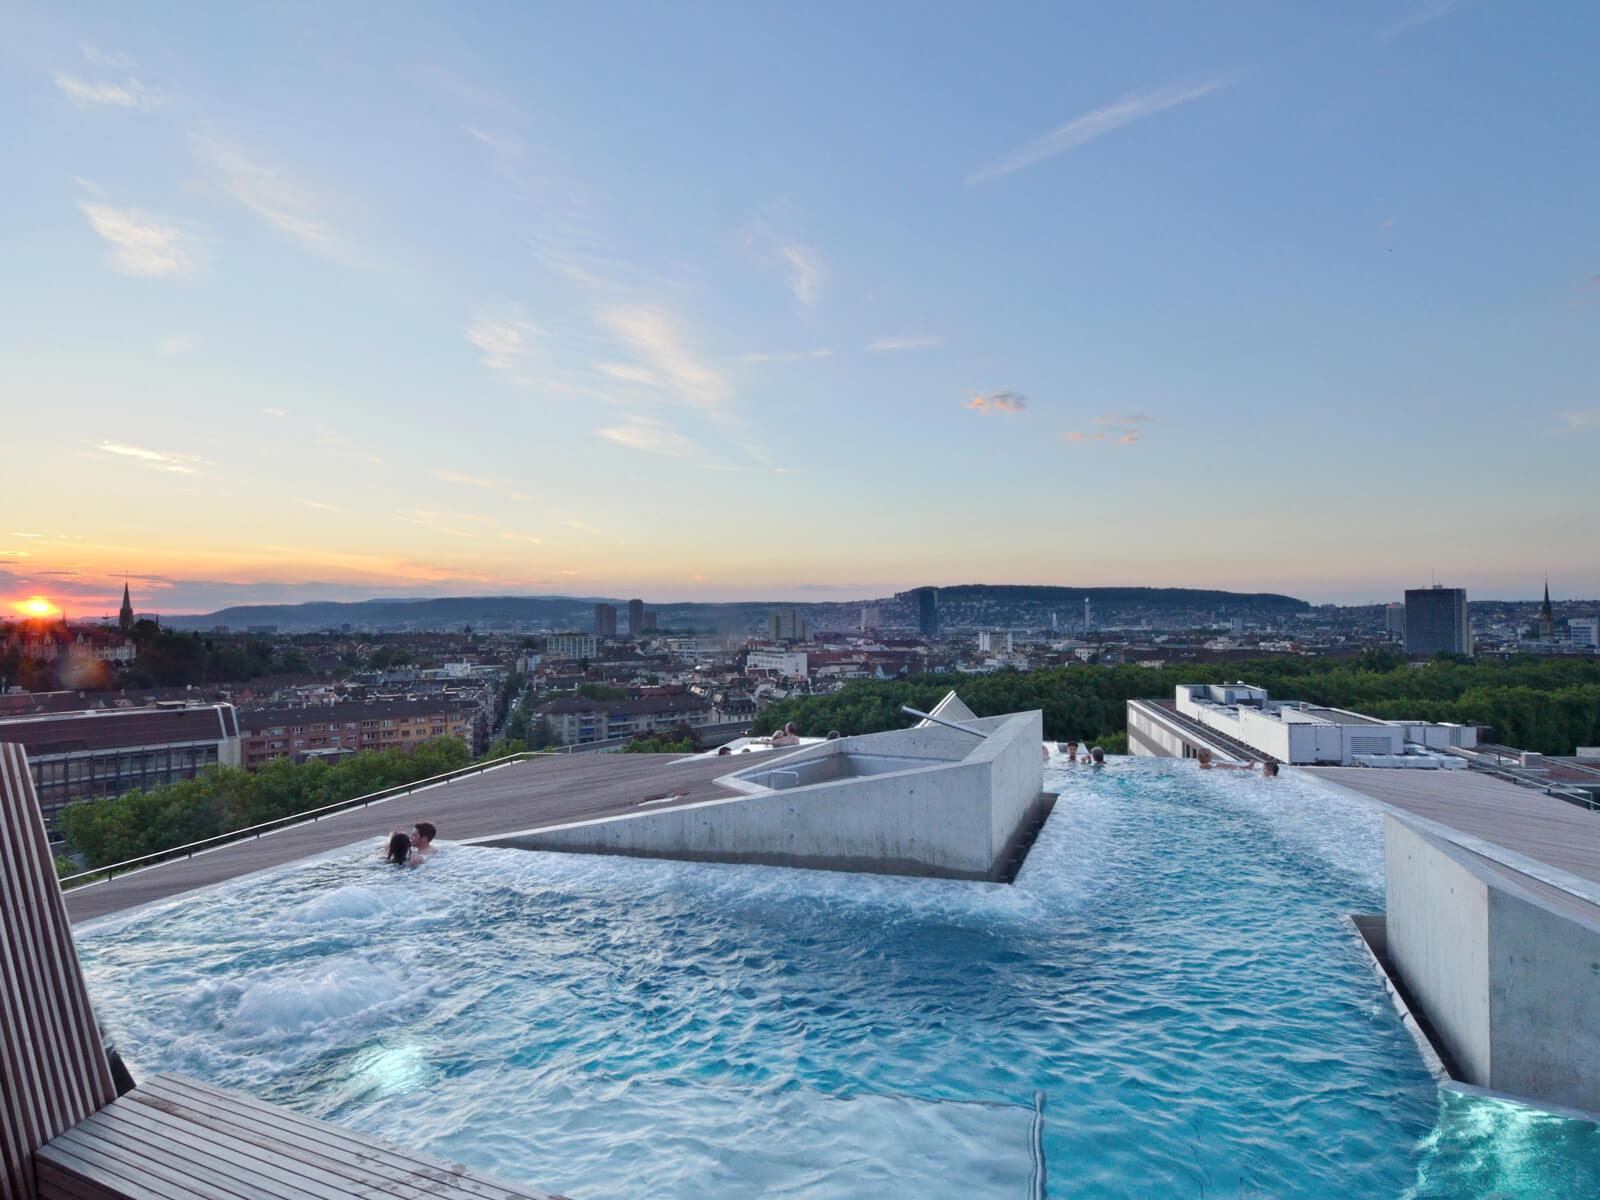 Thermalbad & Spa Zurich